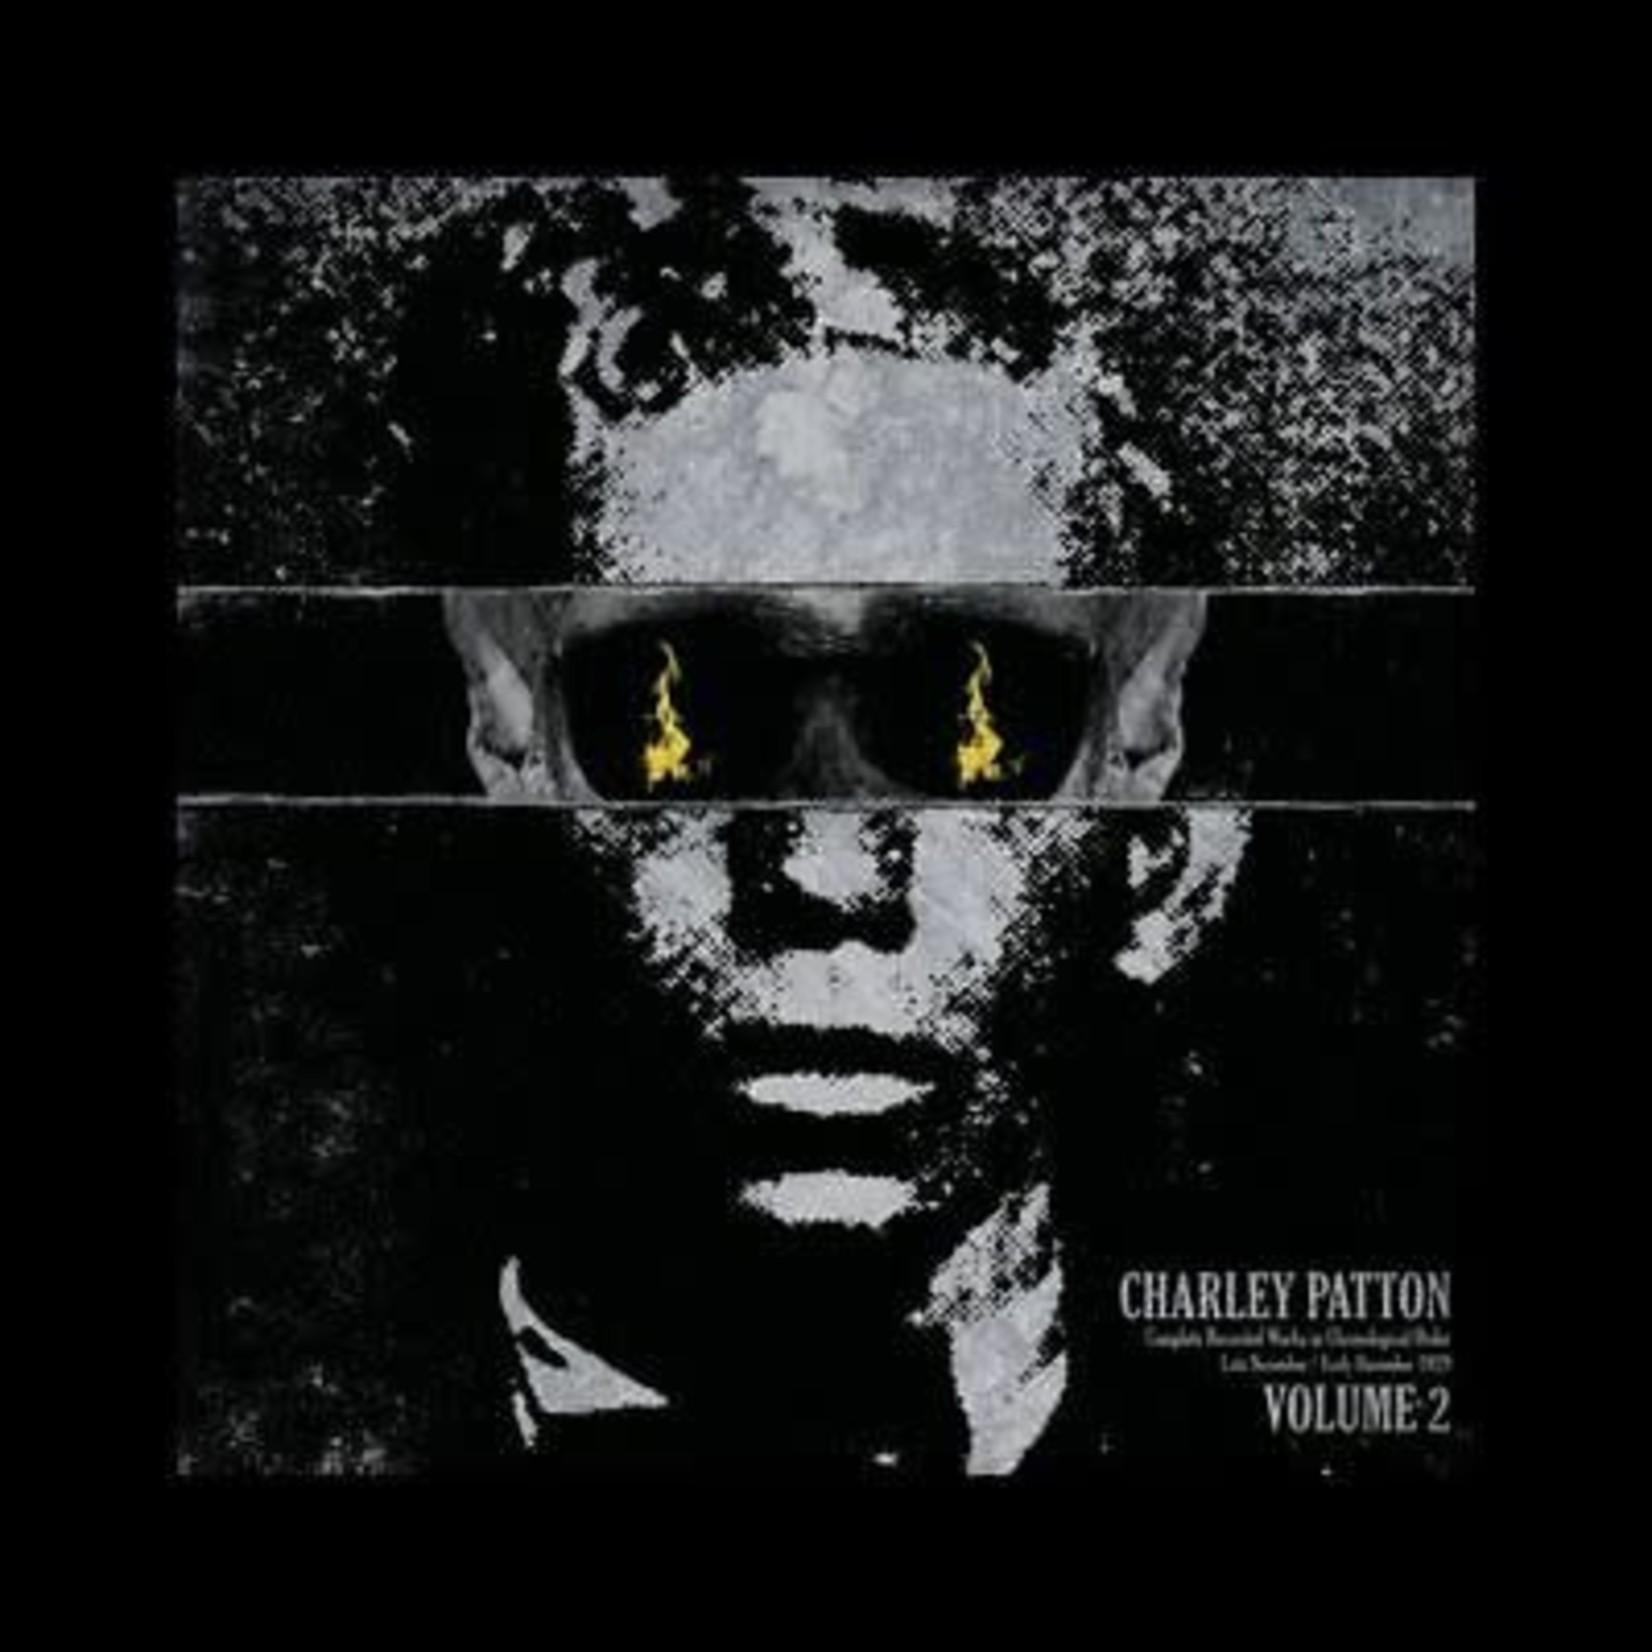 Vinyl Charley Patton - Volume 2. $20